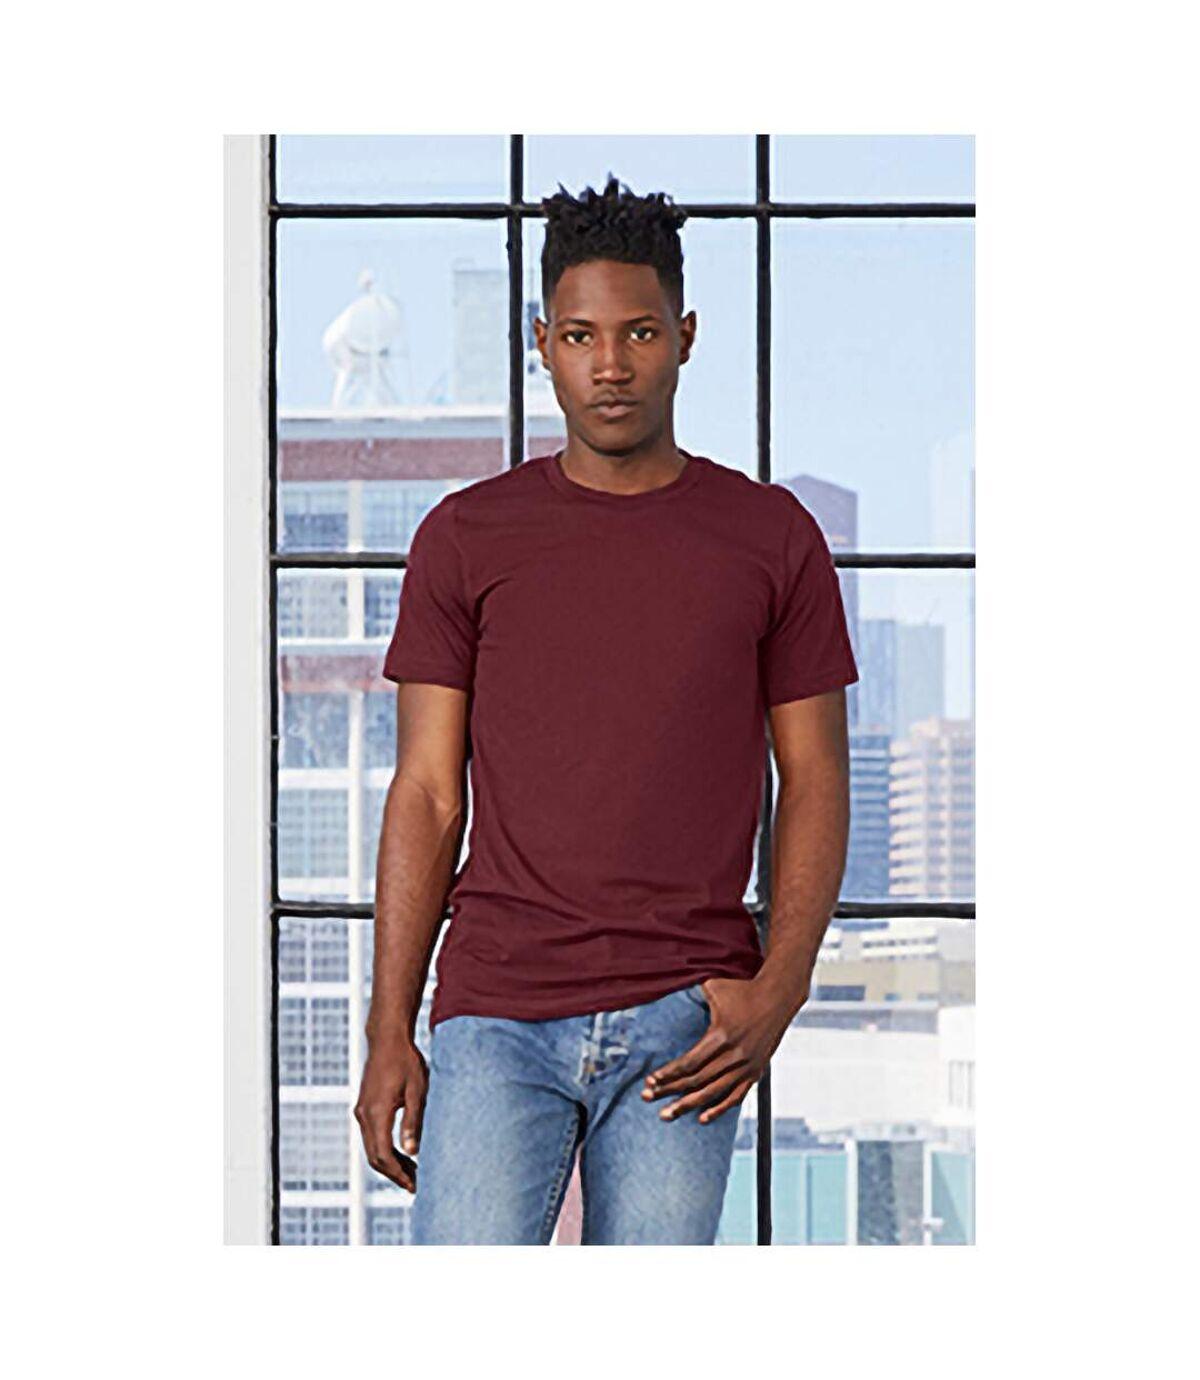 Canvas Unisex Jersey Crew Neck T-Shirt / Mens Short Sleeve T-Shirt (Heather Maroon) - UTBC163